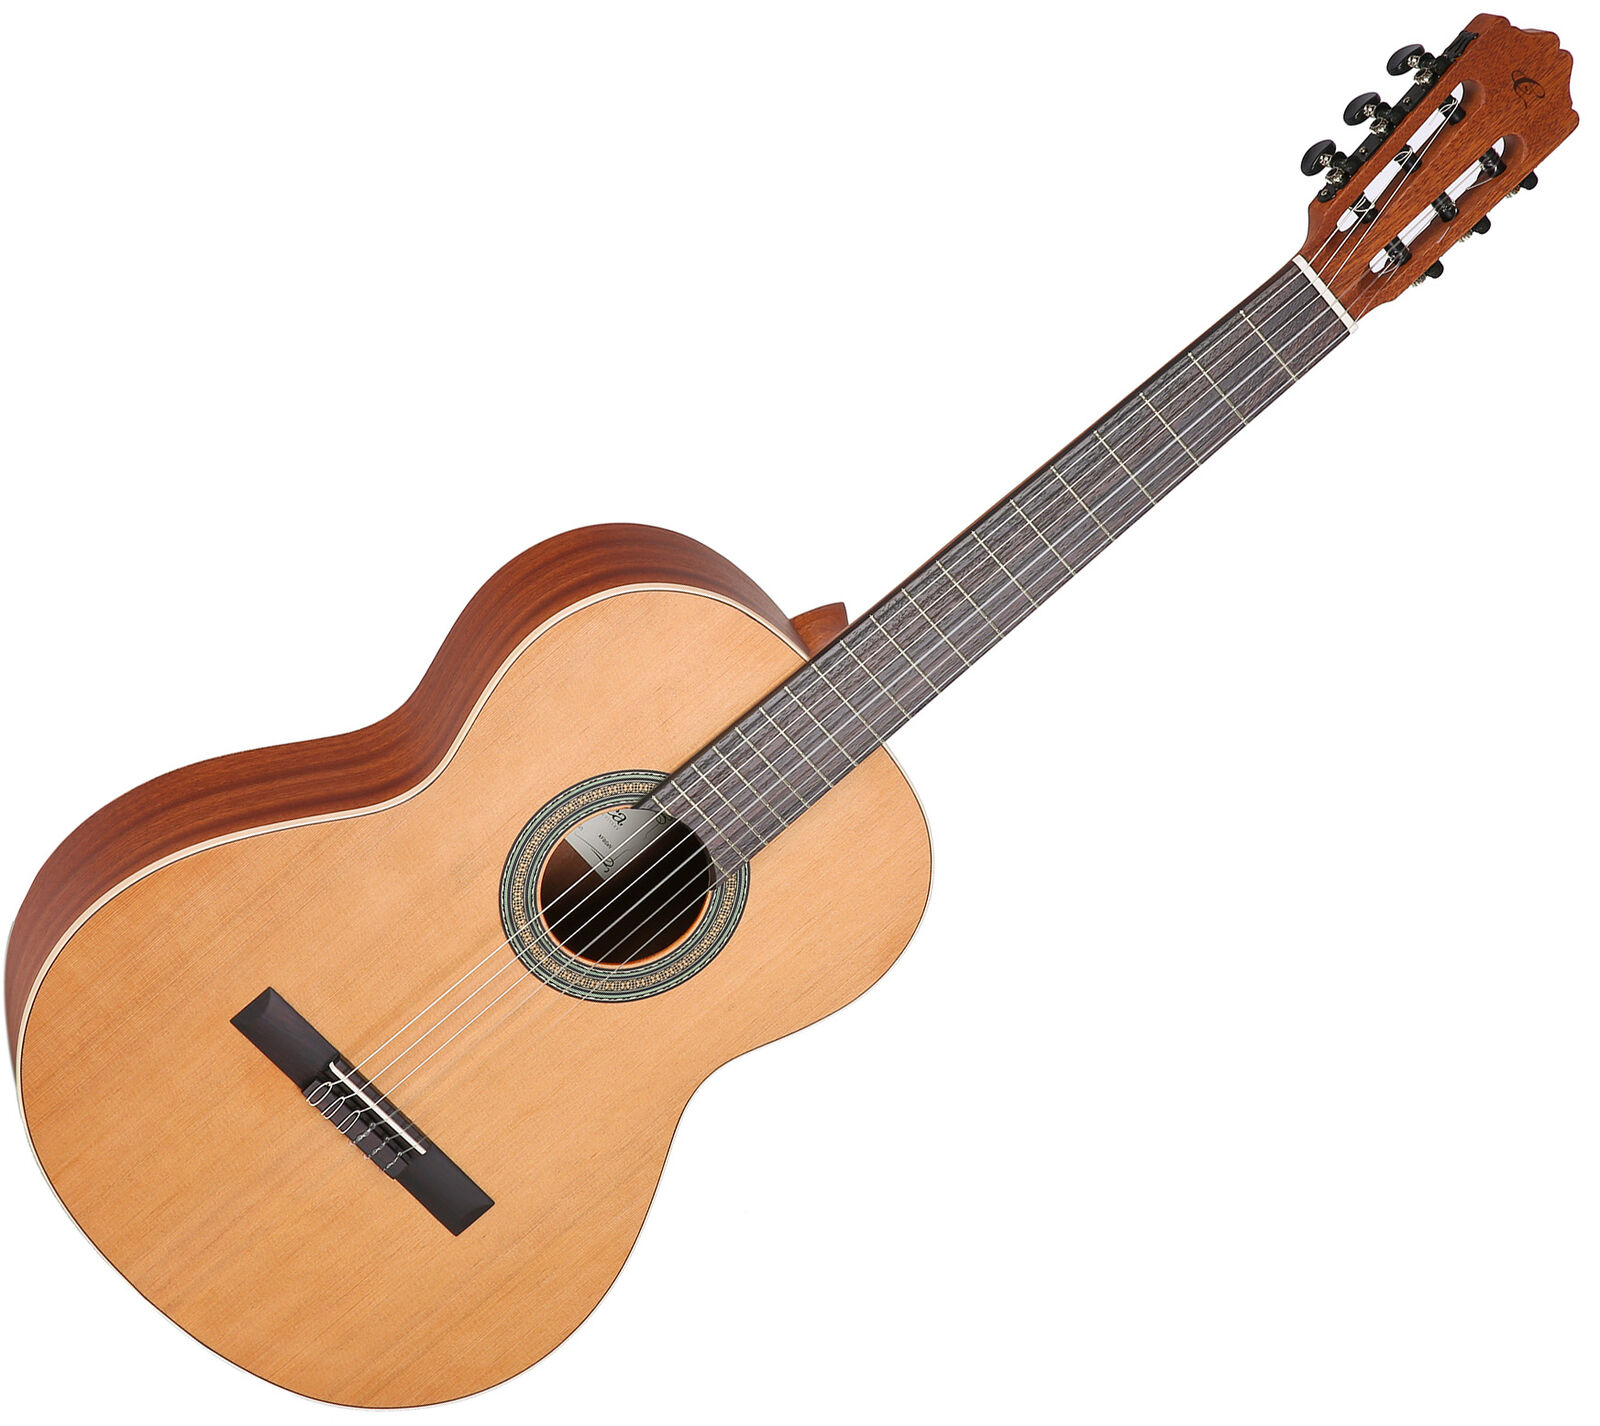 Cuenca 5 Classical Nylon Guitar Classic Solid rot Cedar Top Mahogany Spain